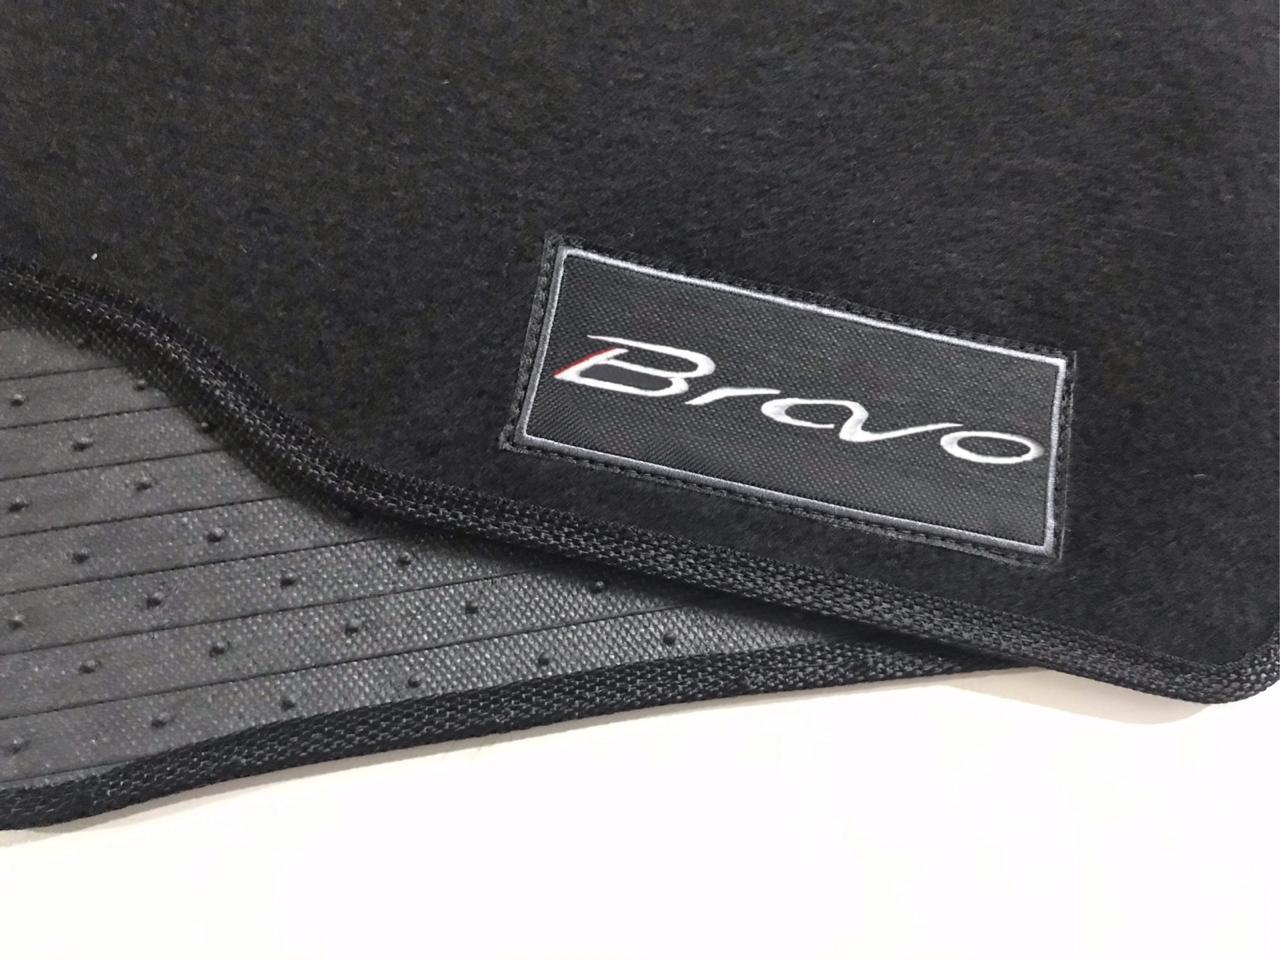 Tapete Fiat Bravo Carpete Exclusiv Base Pinada